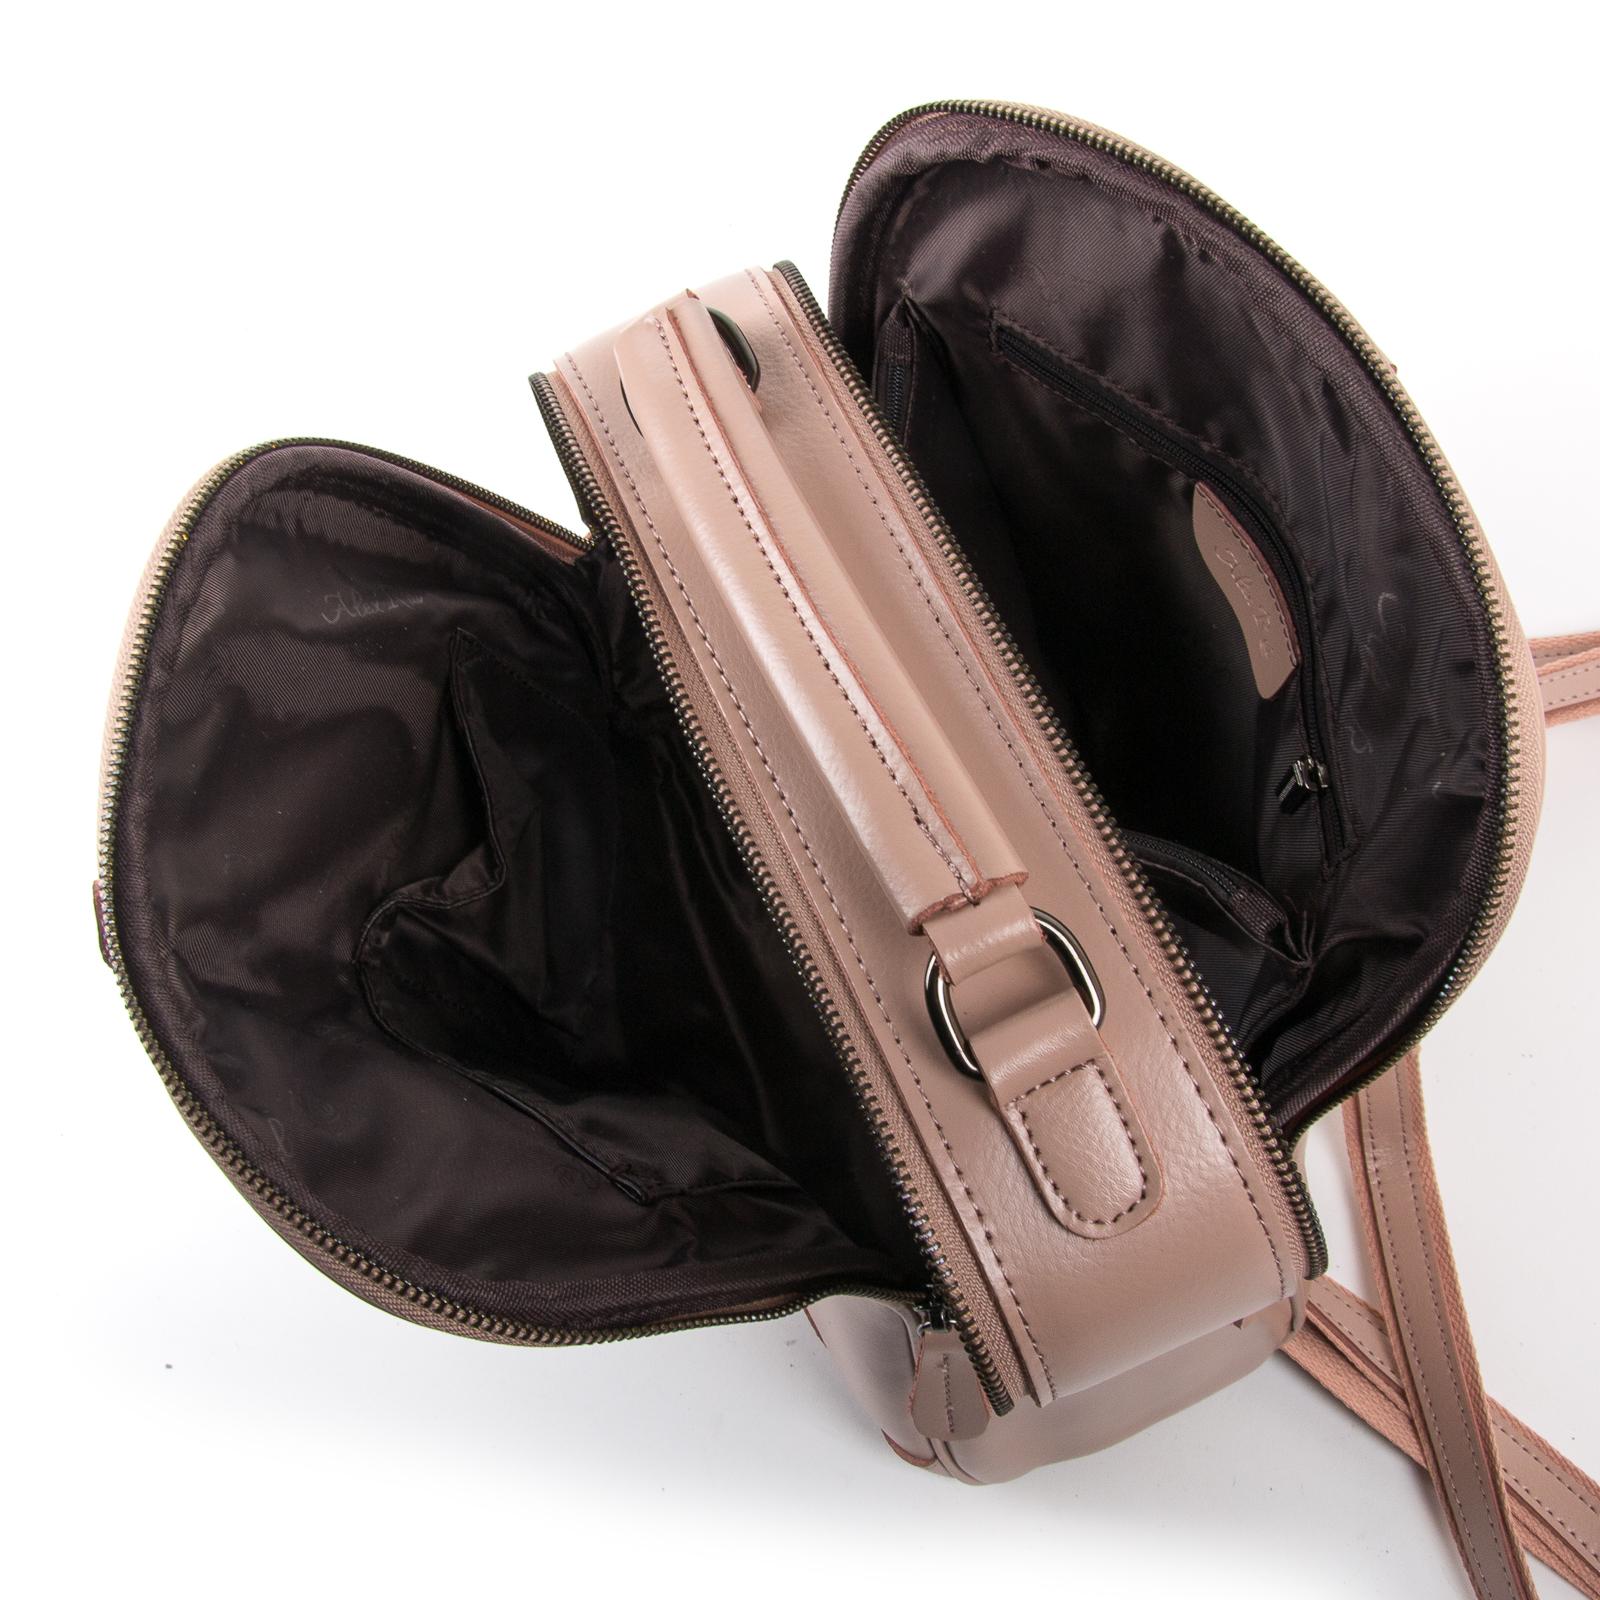 Сумка Женская Рюкзак кожа ALEX RAI 8694-3 pink - фото 5